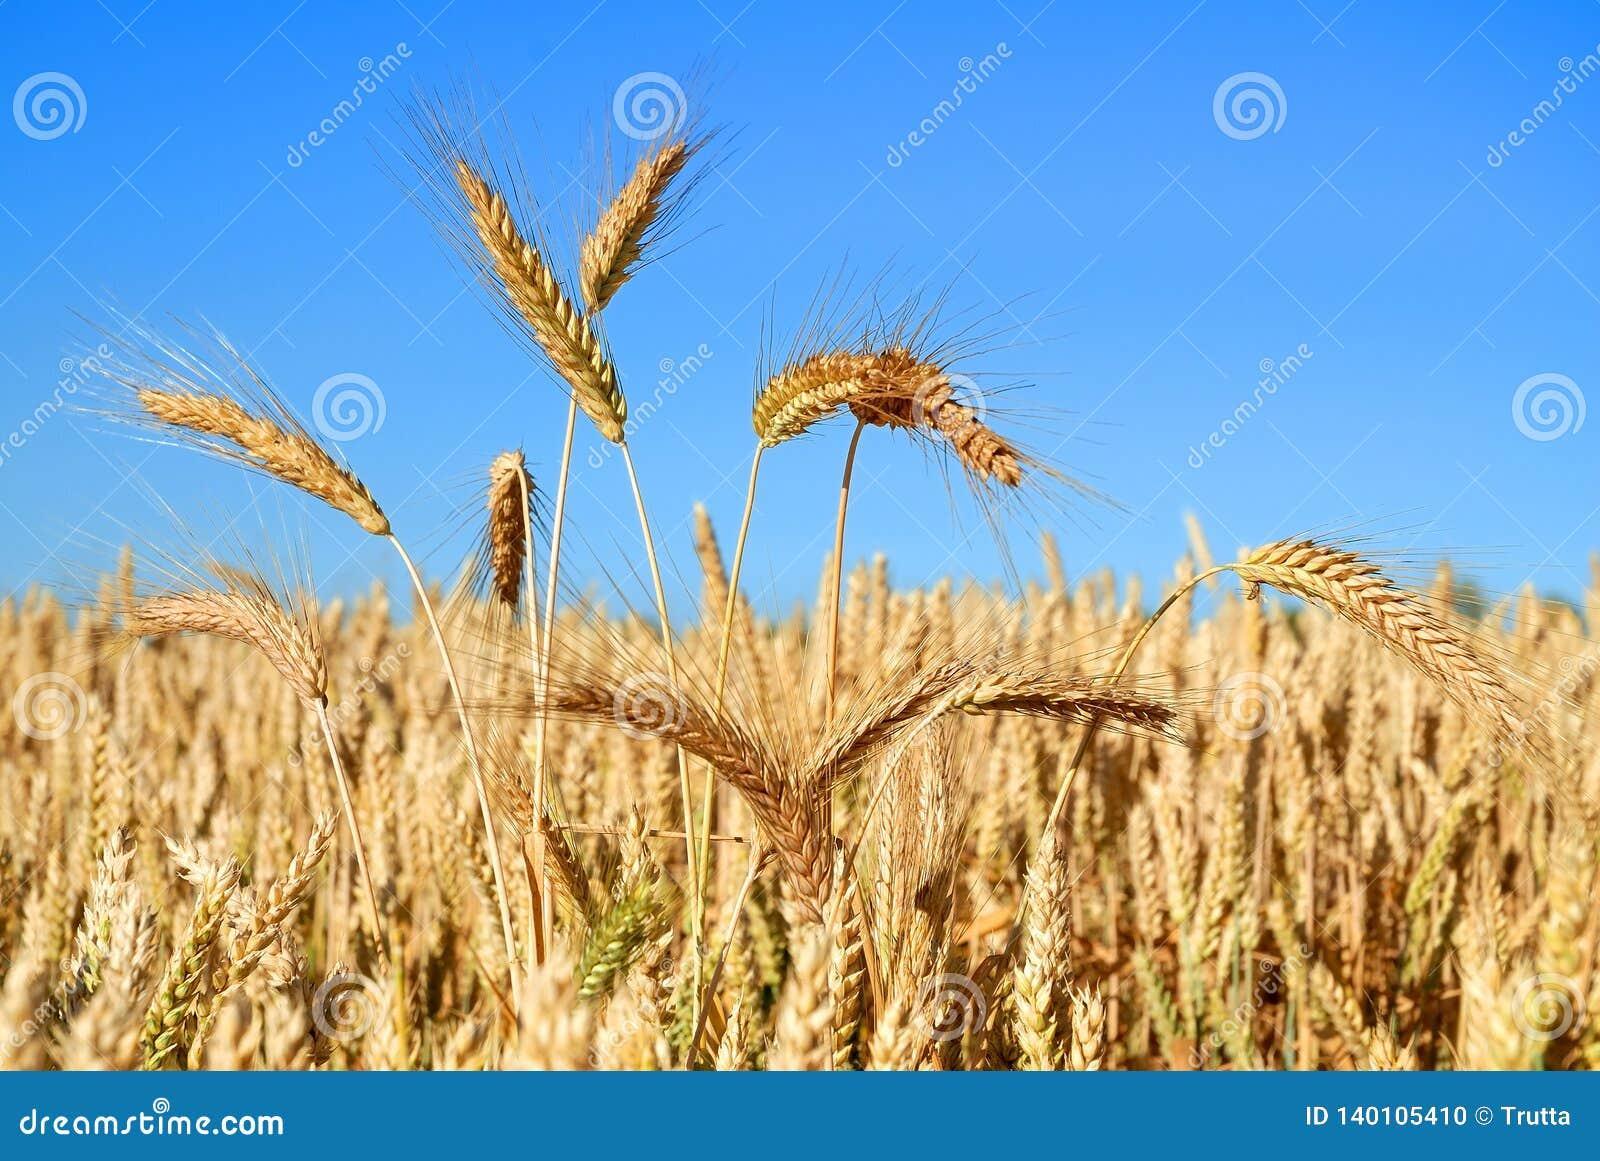 Oídos del maíz maduro